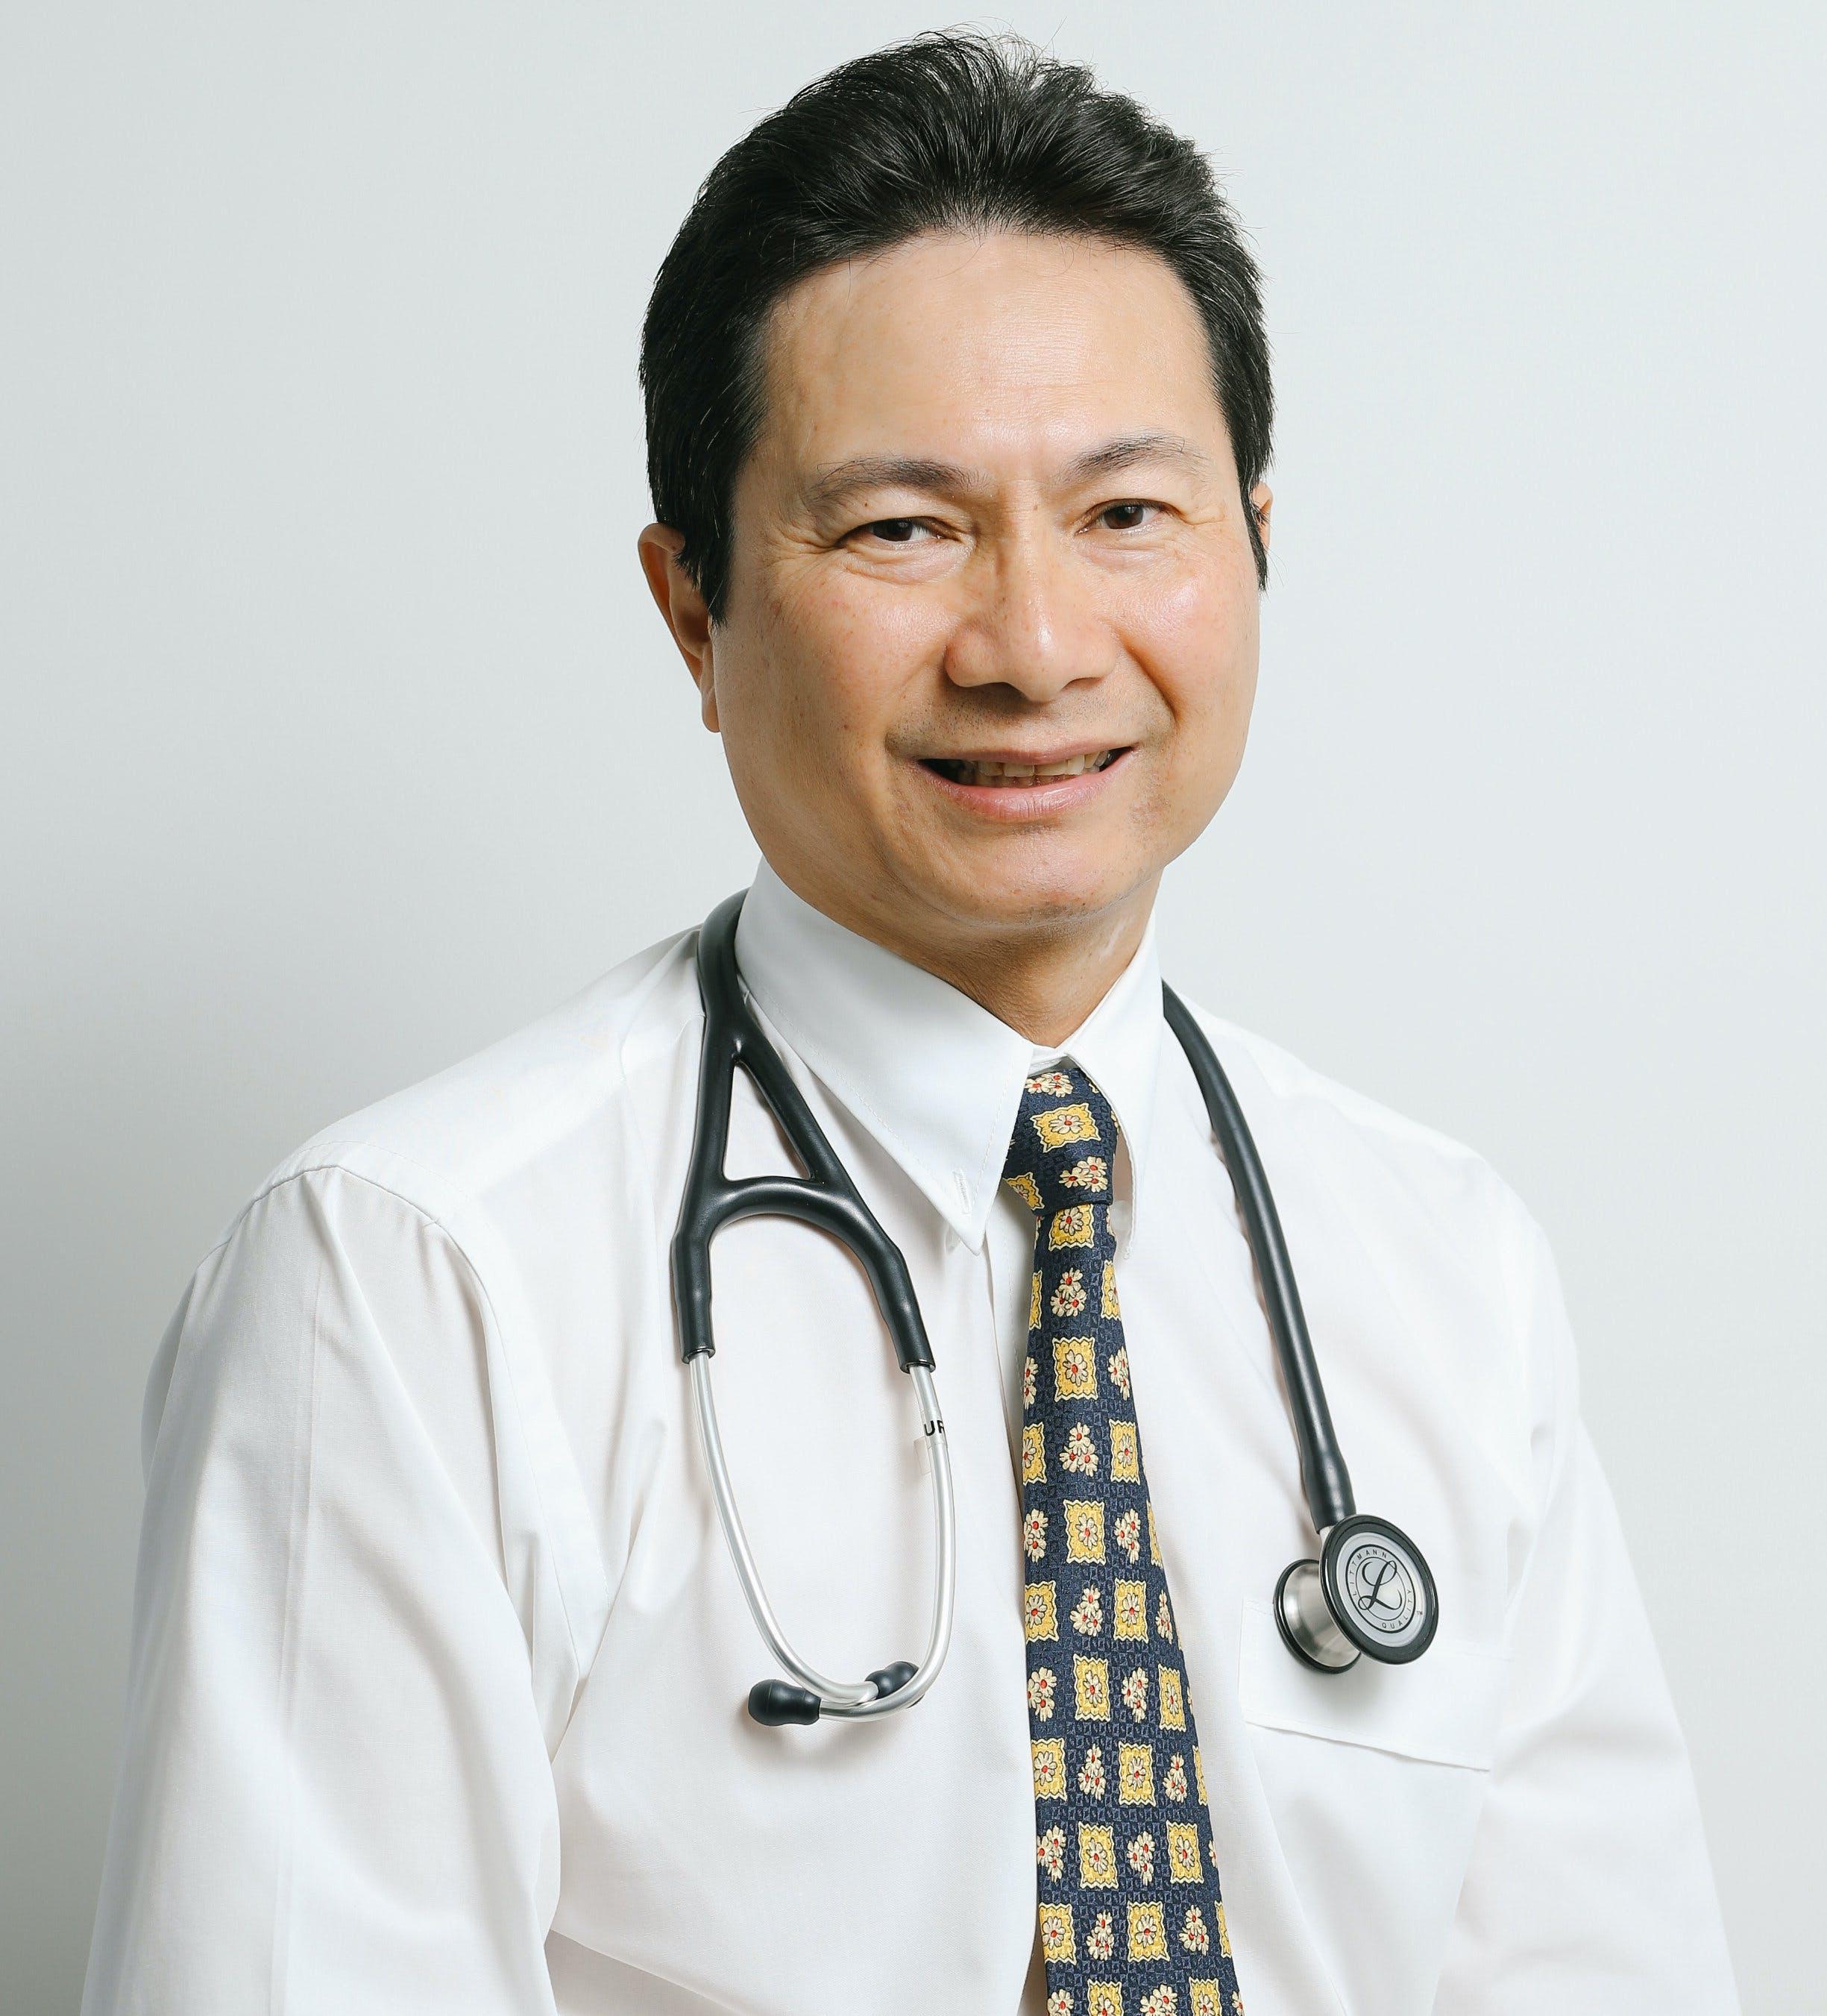 Dr John Stanford - Holsworthy Doctor GP - HealthEngine